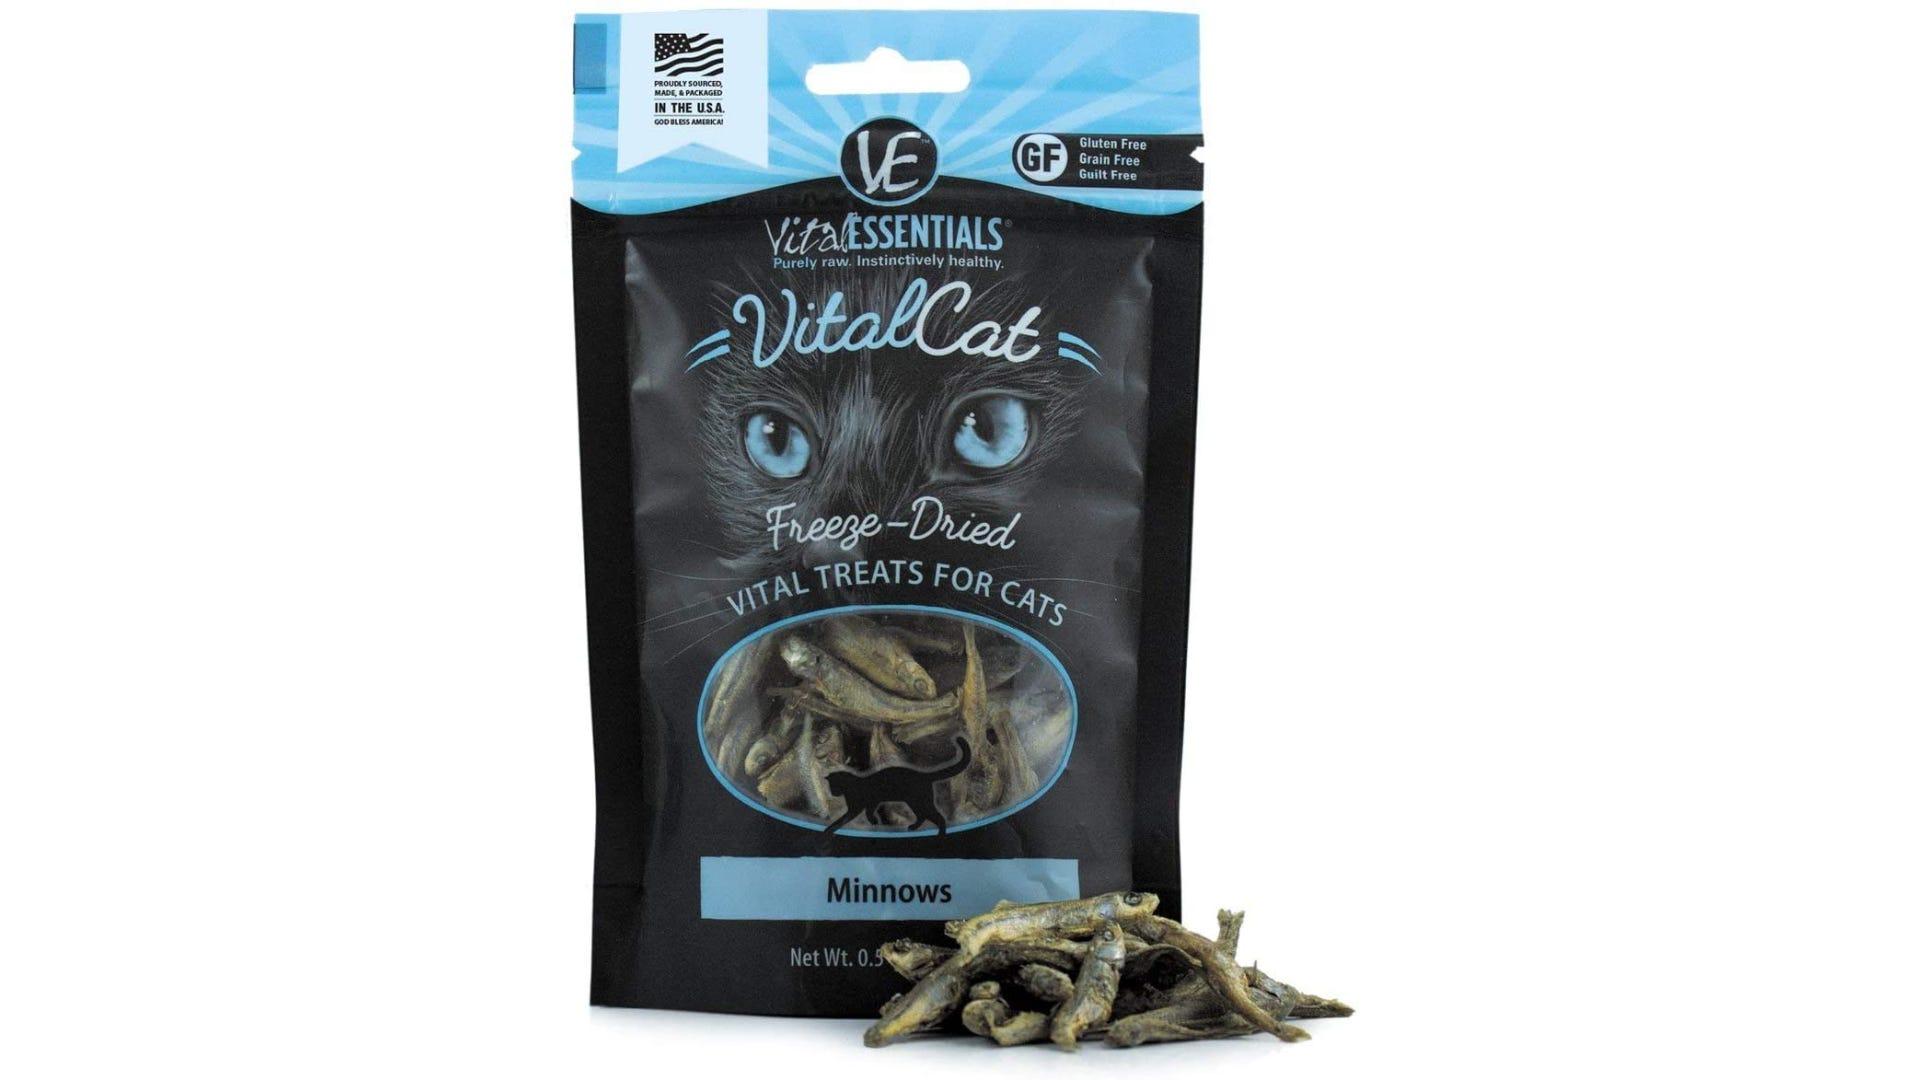 a bag of Vital Essentials freeze-dried minnows cat treats